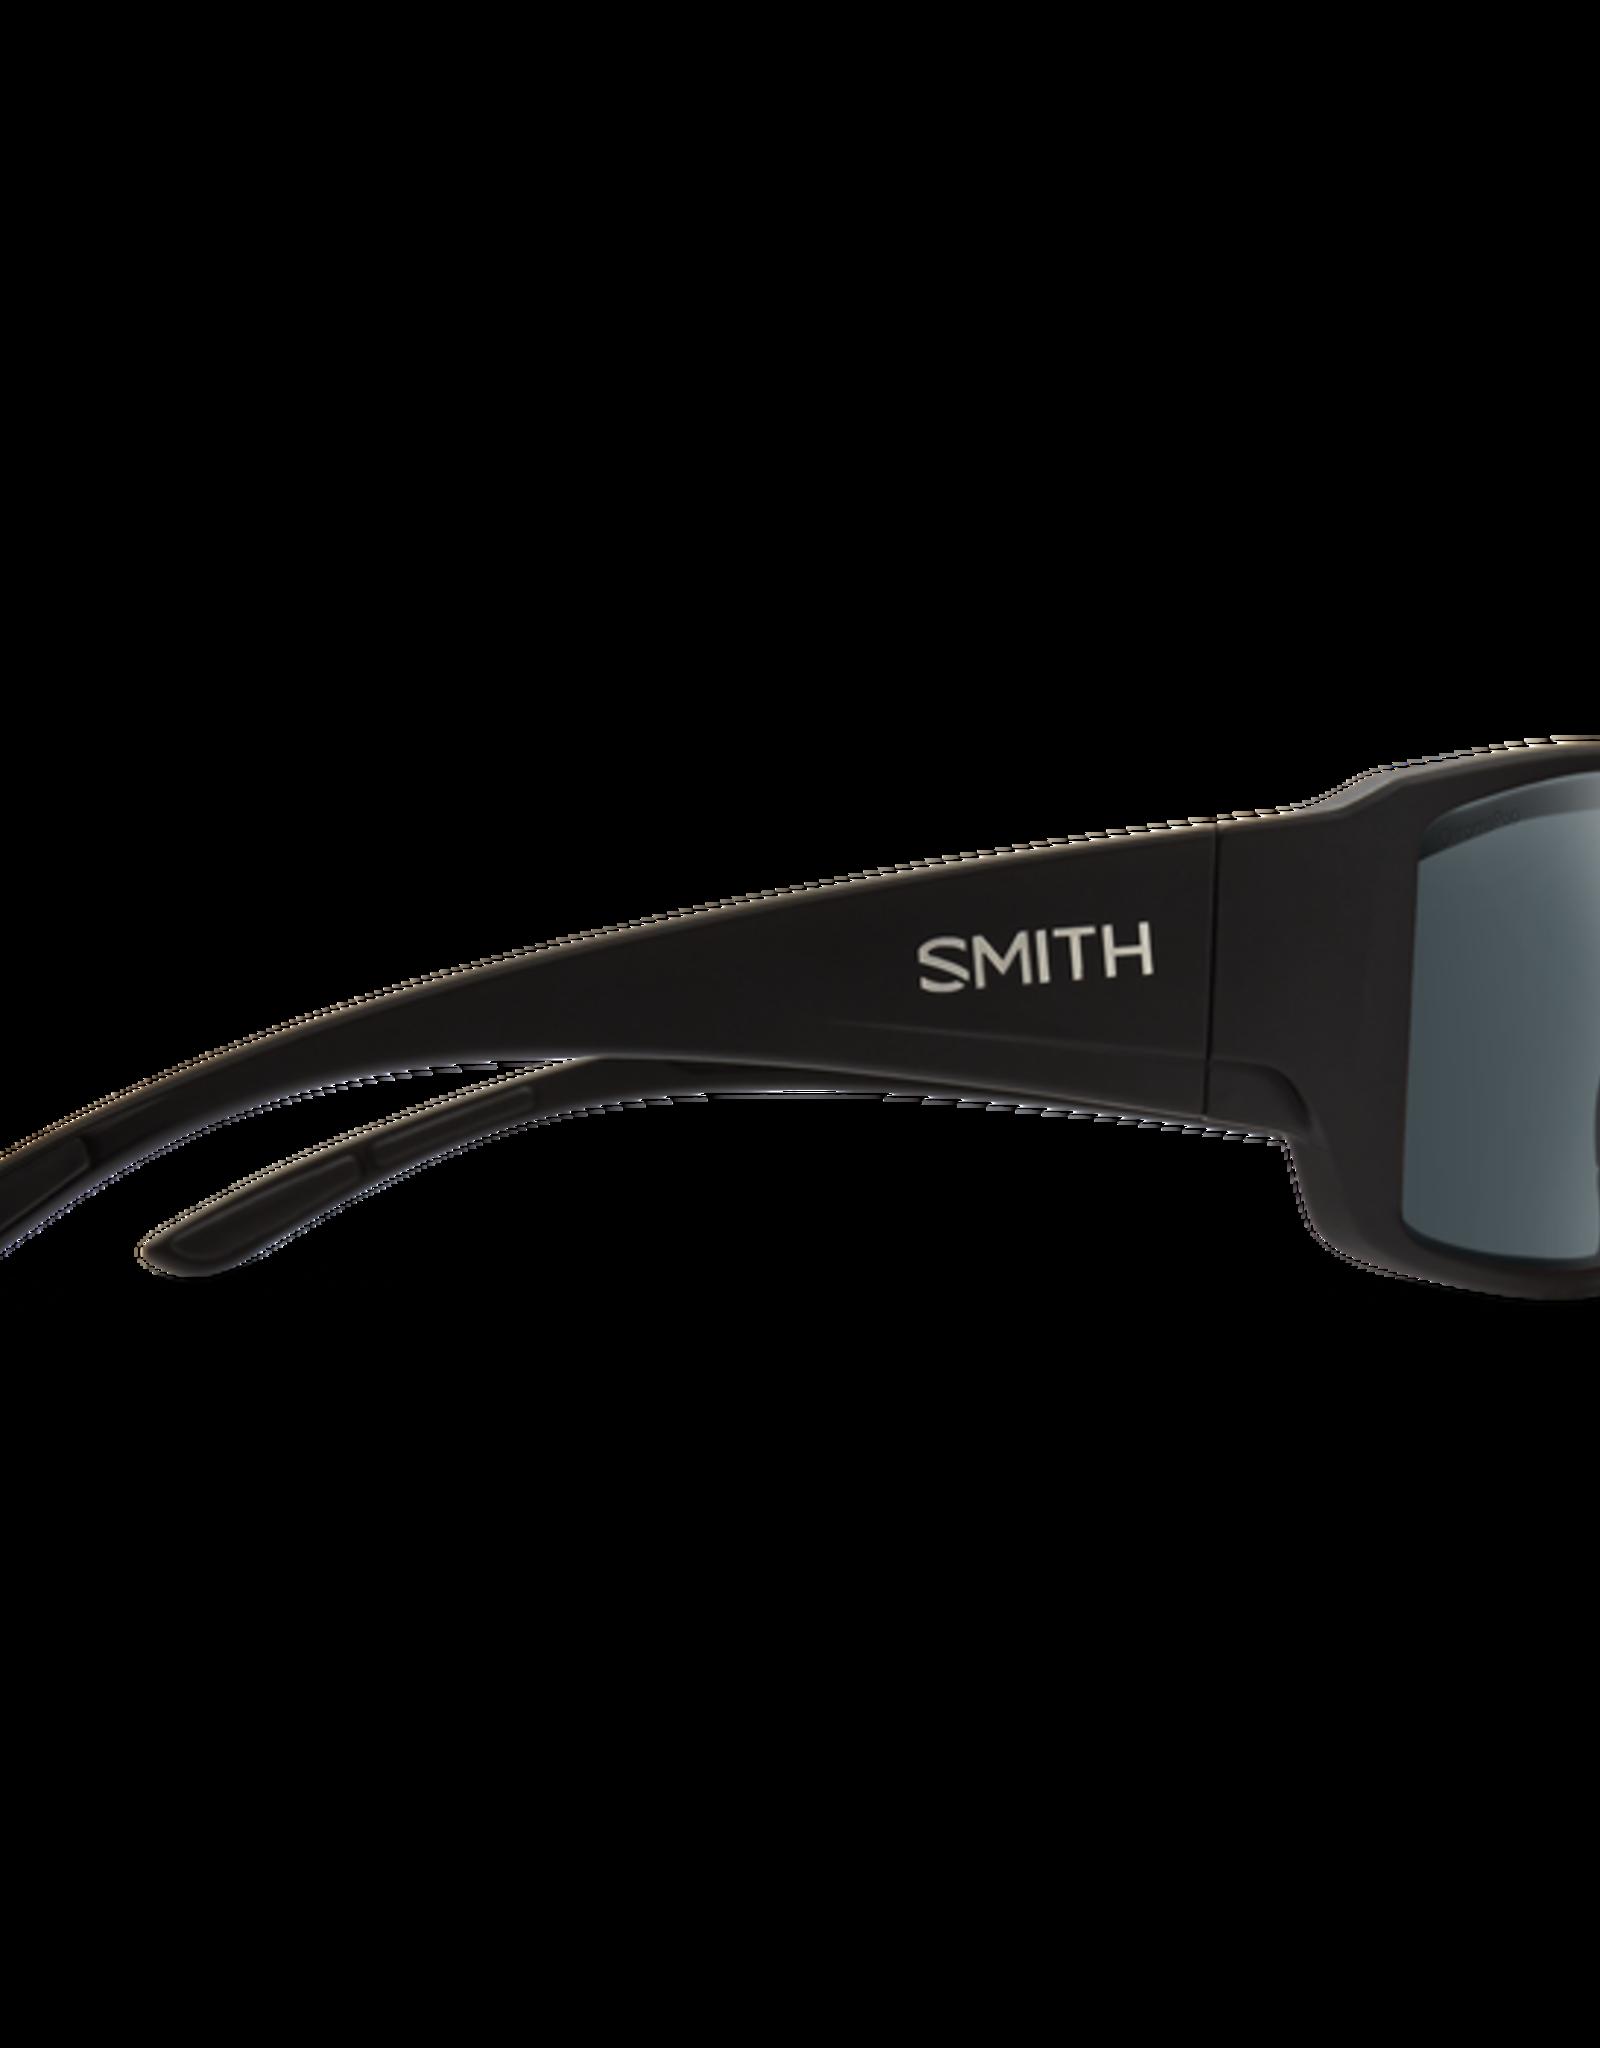 SMITH OPTICS SMITH Sunglasses GUIDES CHOICE Matte Black ChromaPop Glass Polarized Gray